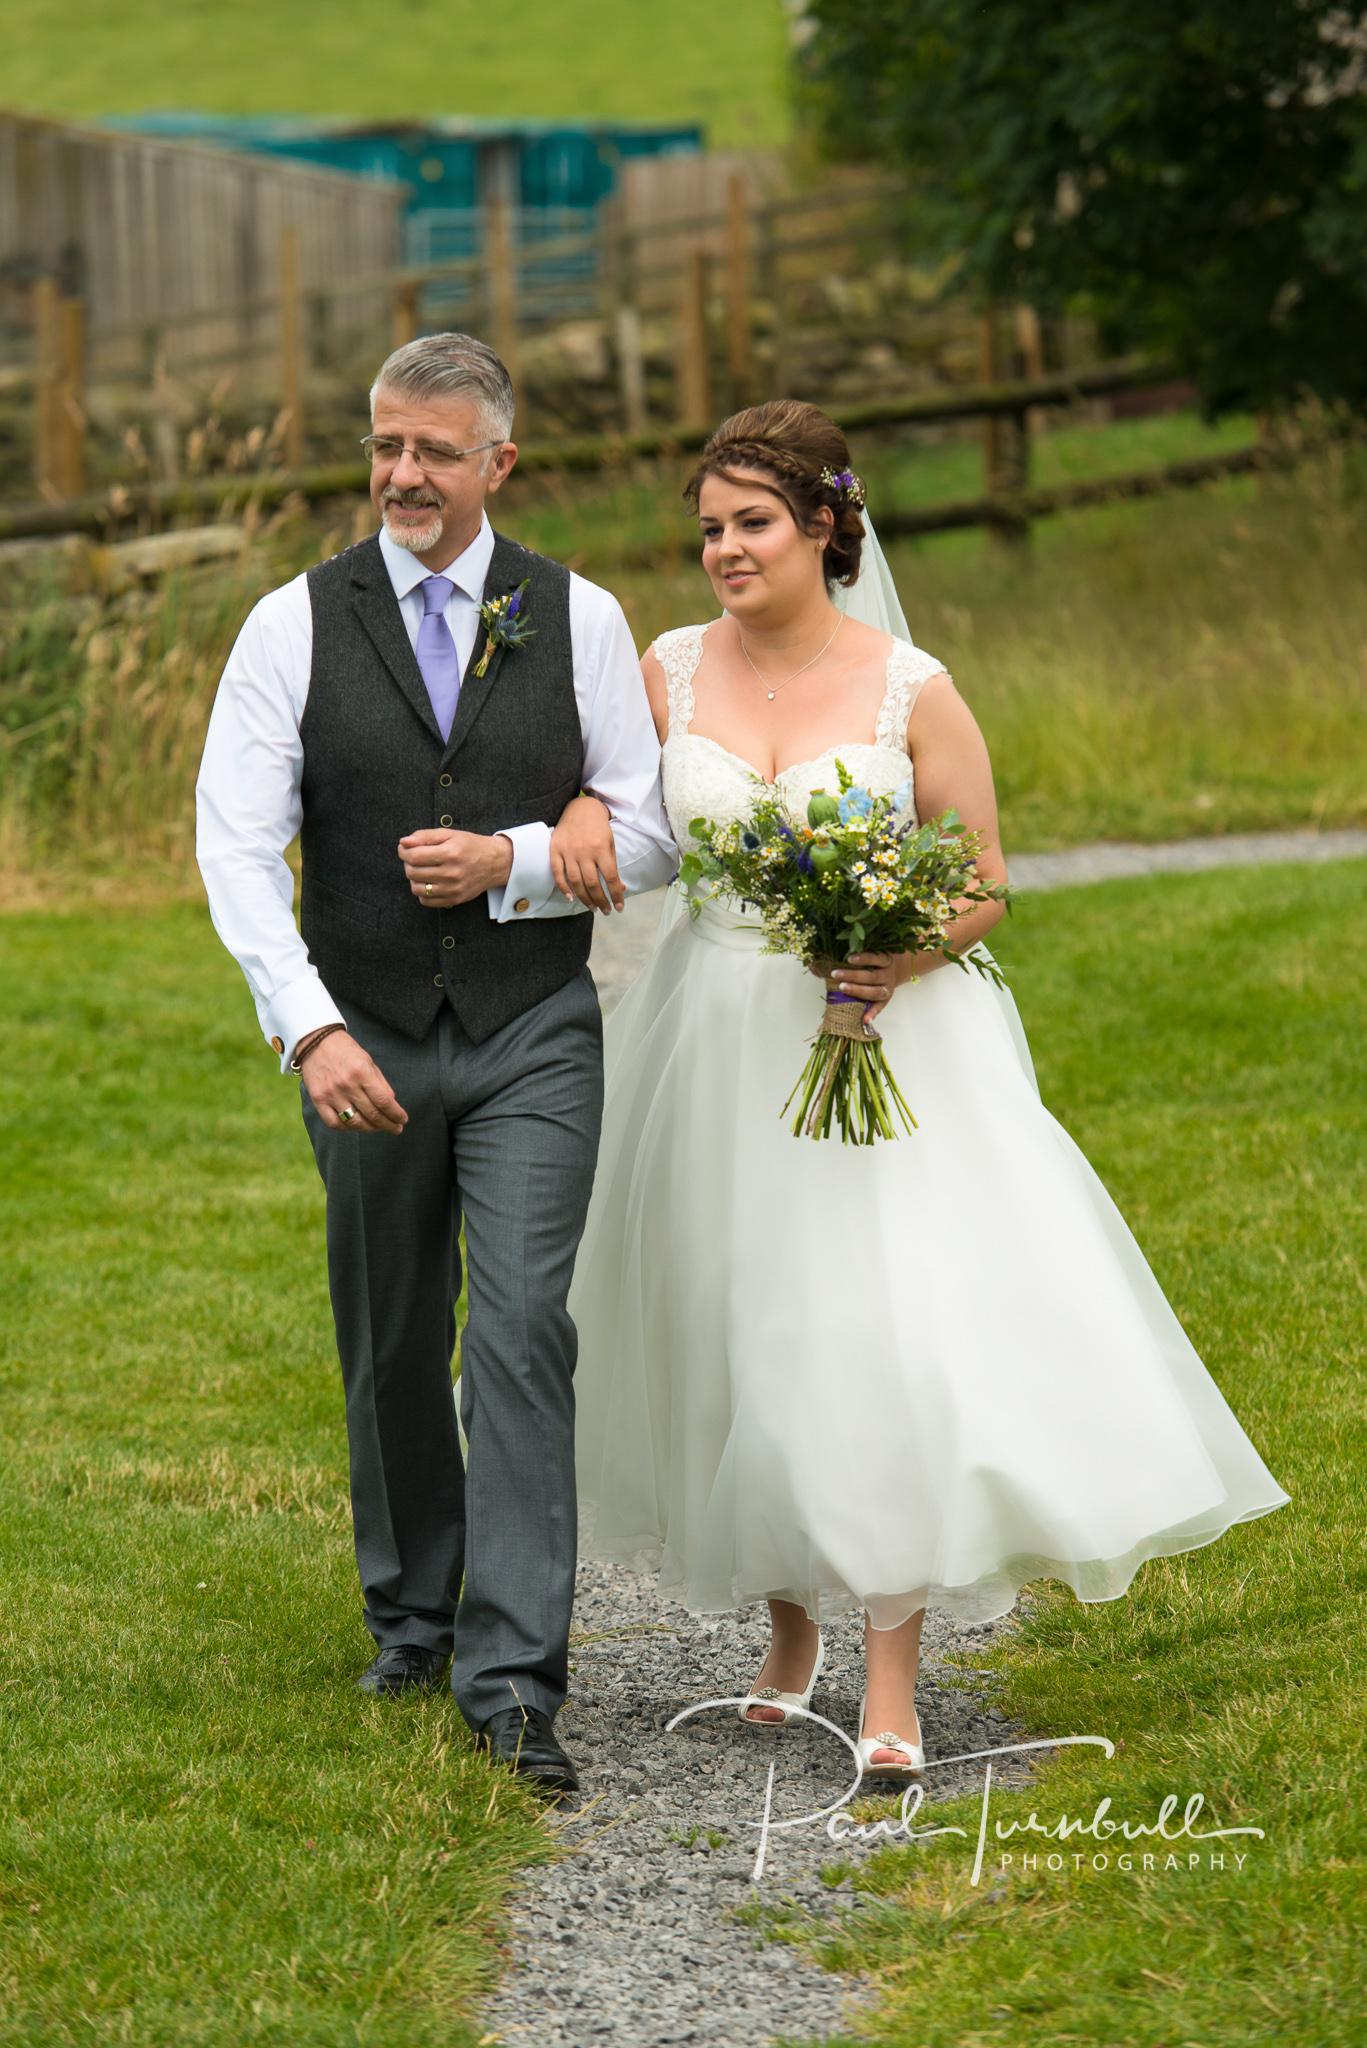 wedding-photographer-hilltop-farm-ilton-yorkshire-011.jpg